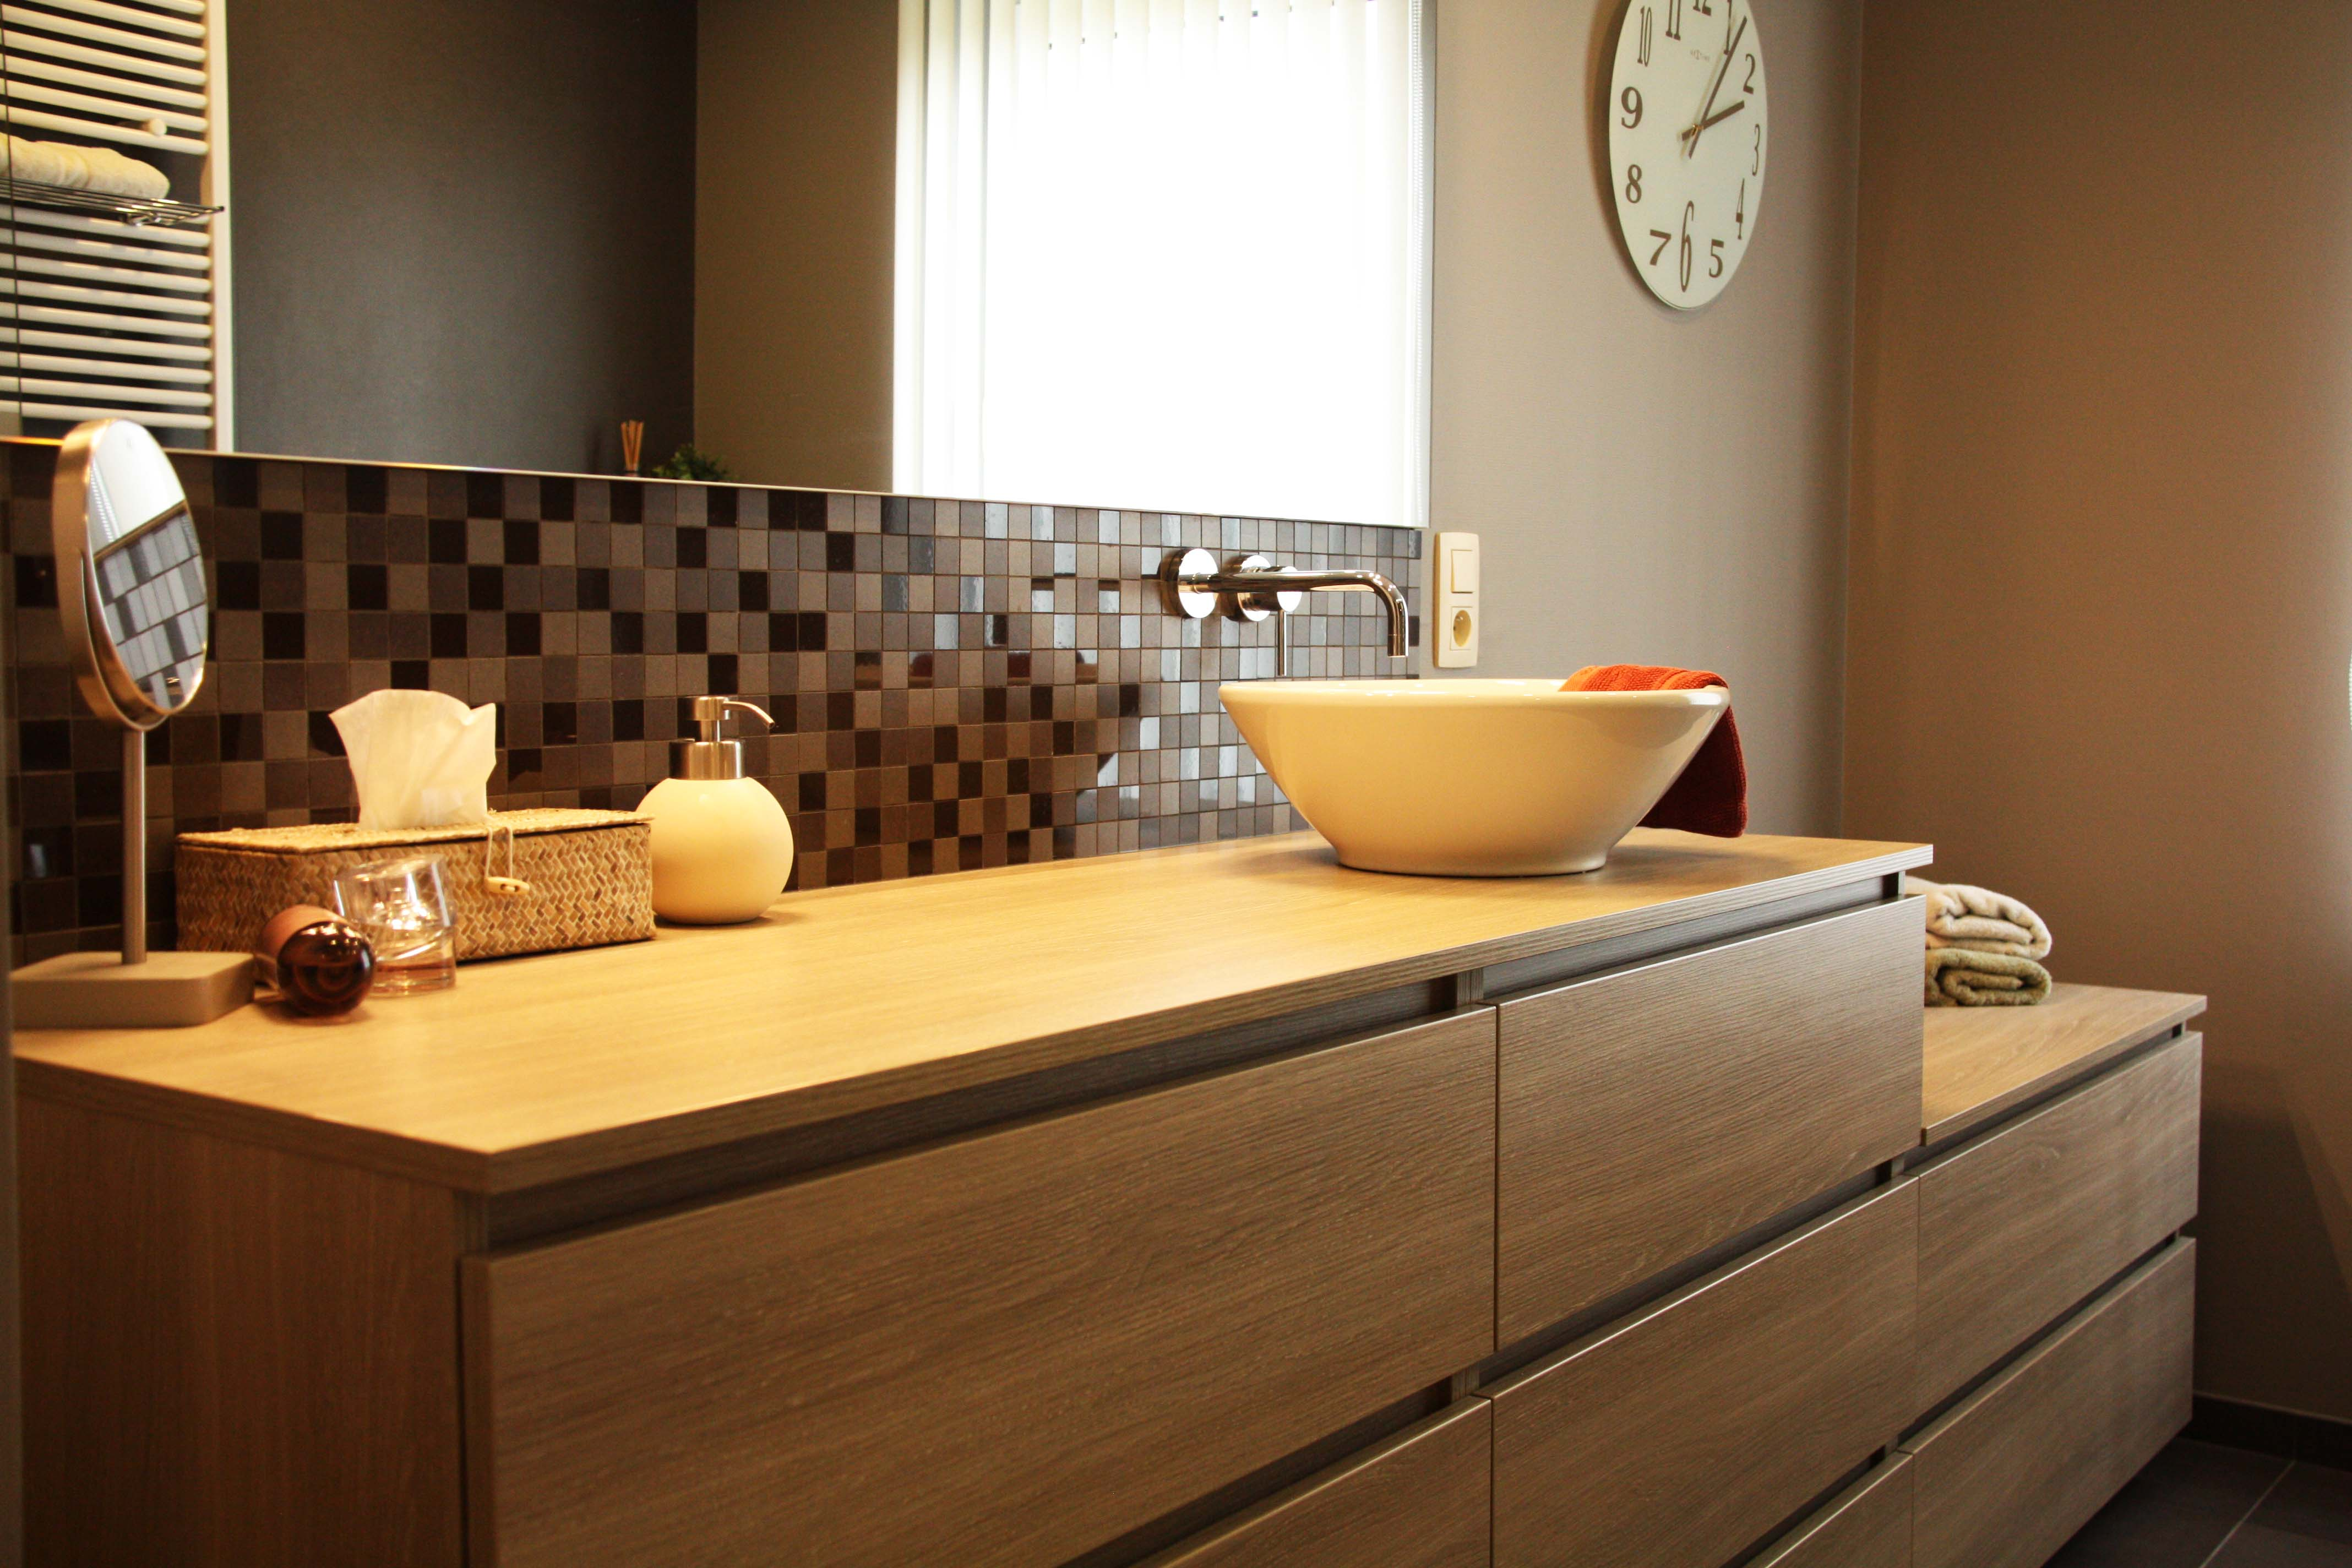 aQuizien | Keukens en badkamers Dendermonde, Hamme